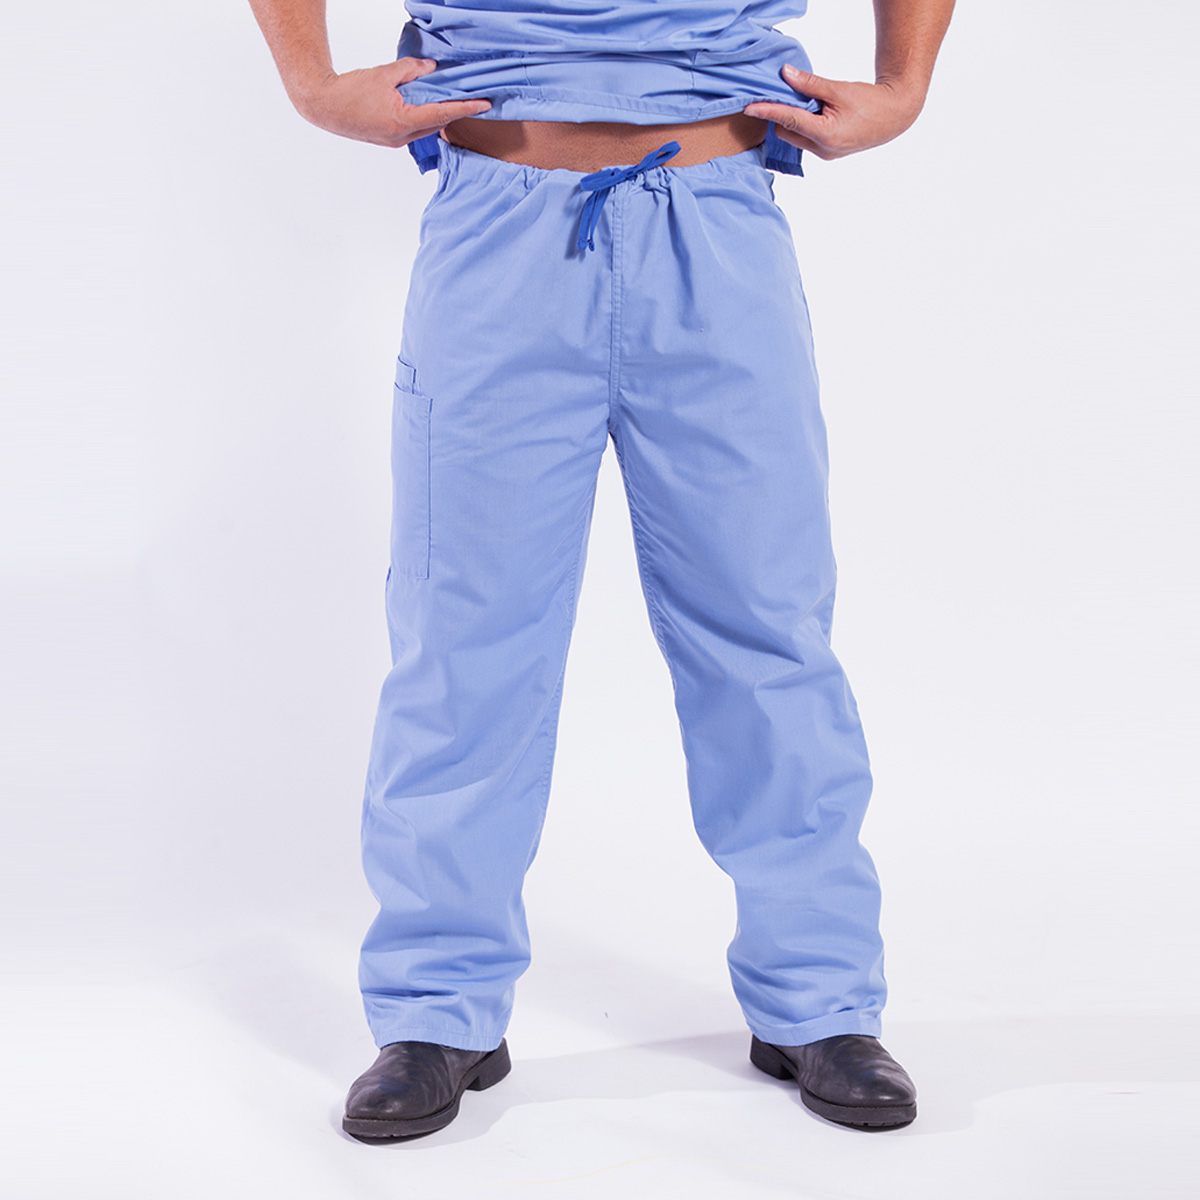 Men's Essential Scrub Pants | Edgar James Apparel